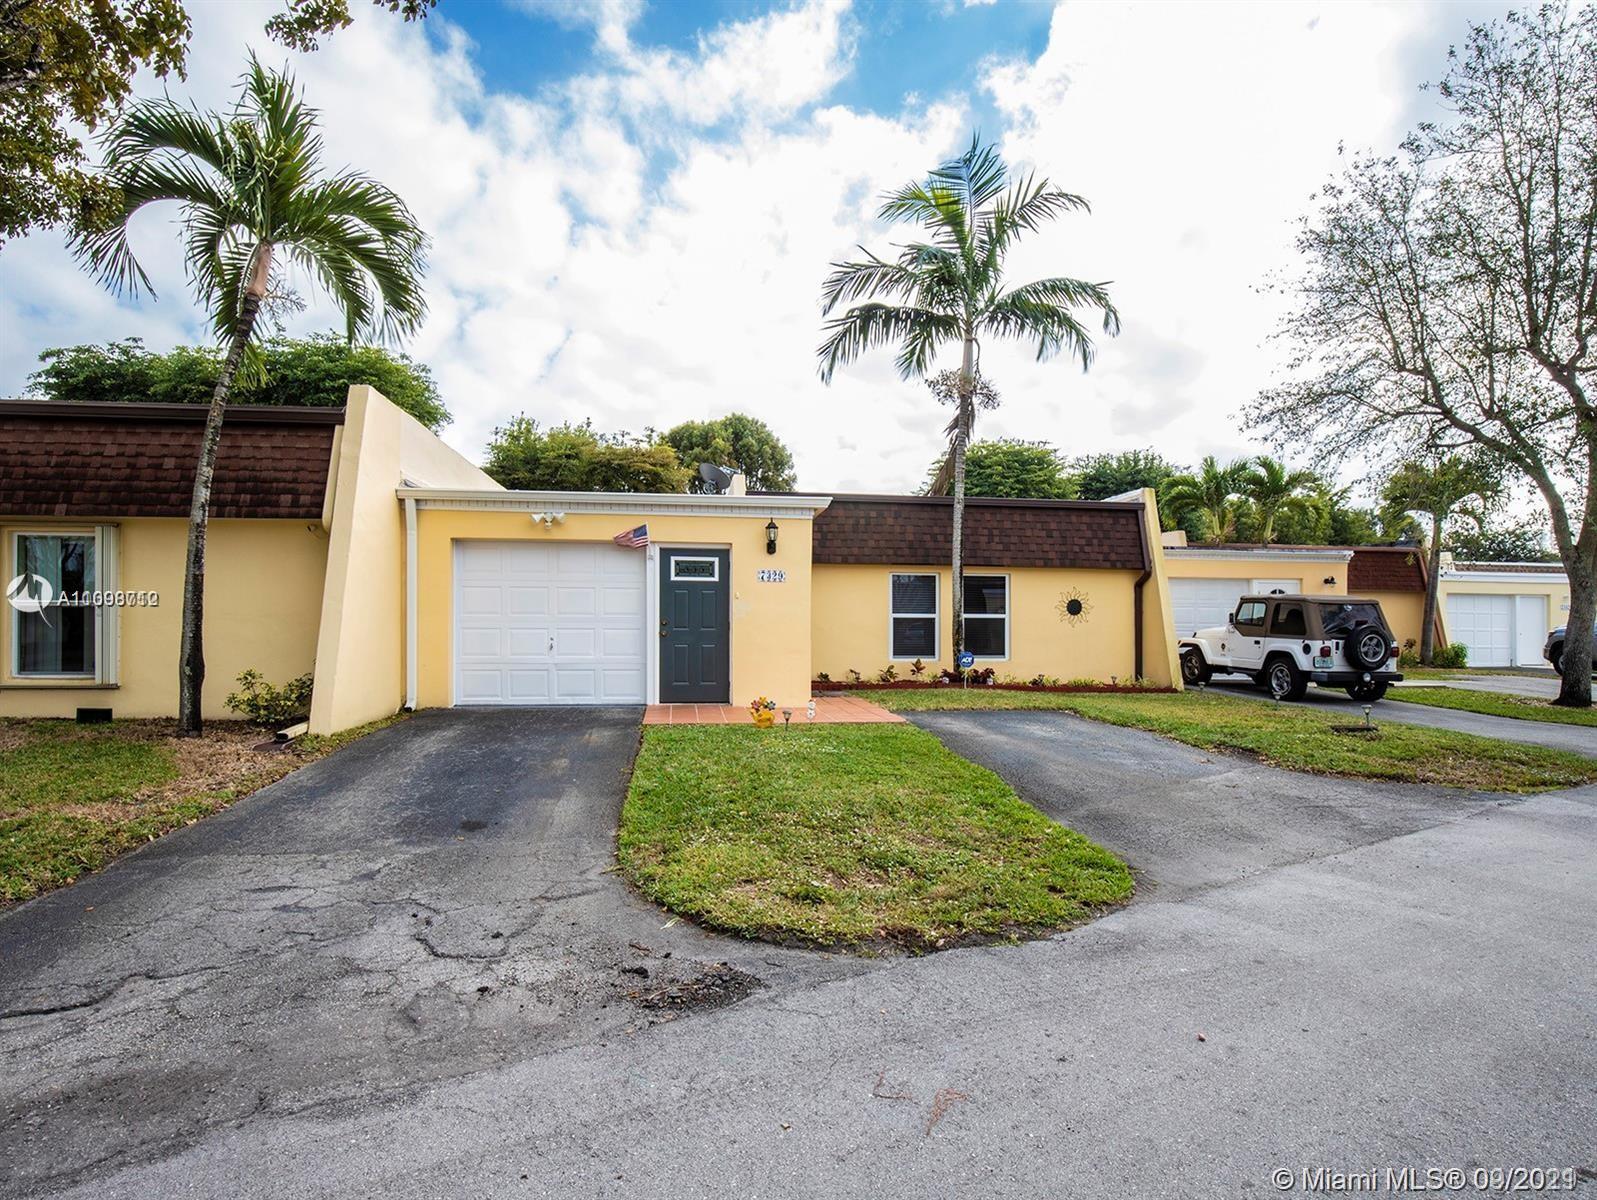 Country Club Of Miam #7329 - 7329 Stardust Dr #7329, Hialeah, FL 33015